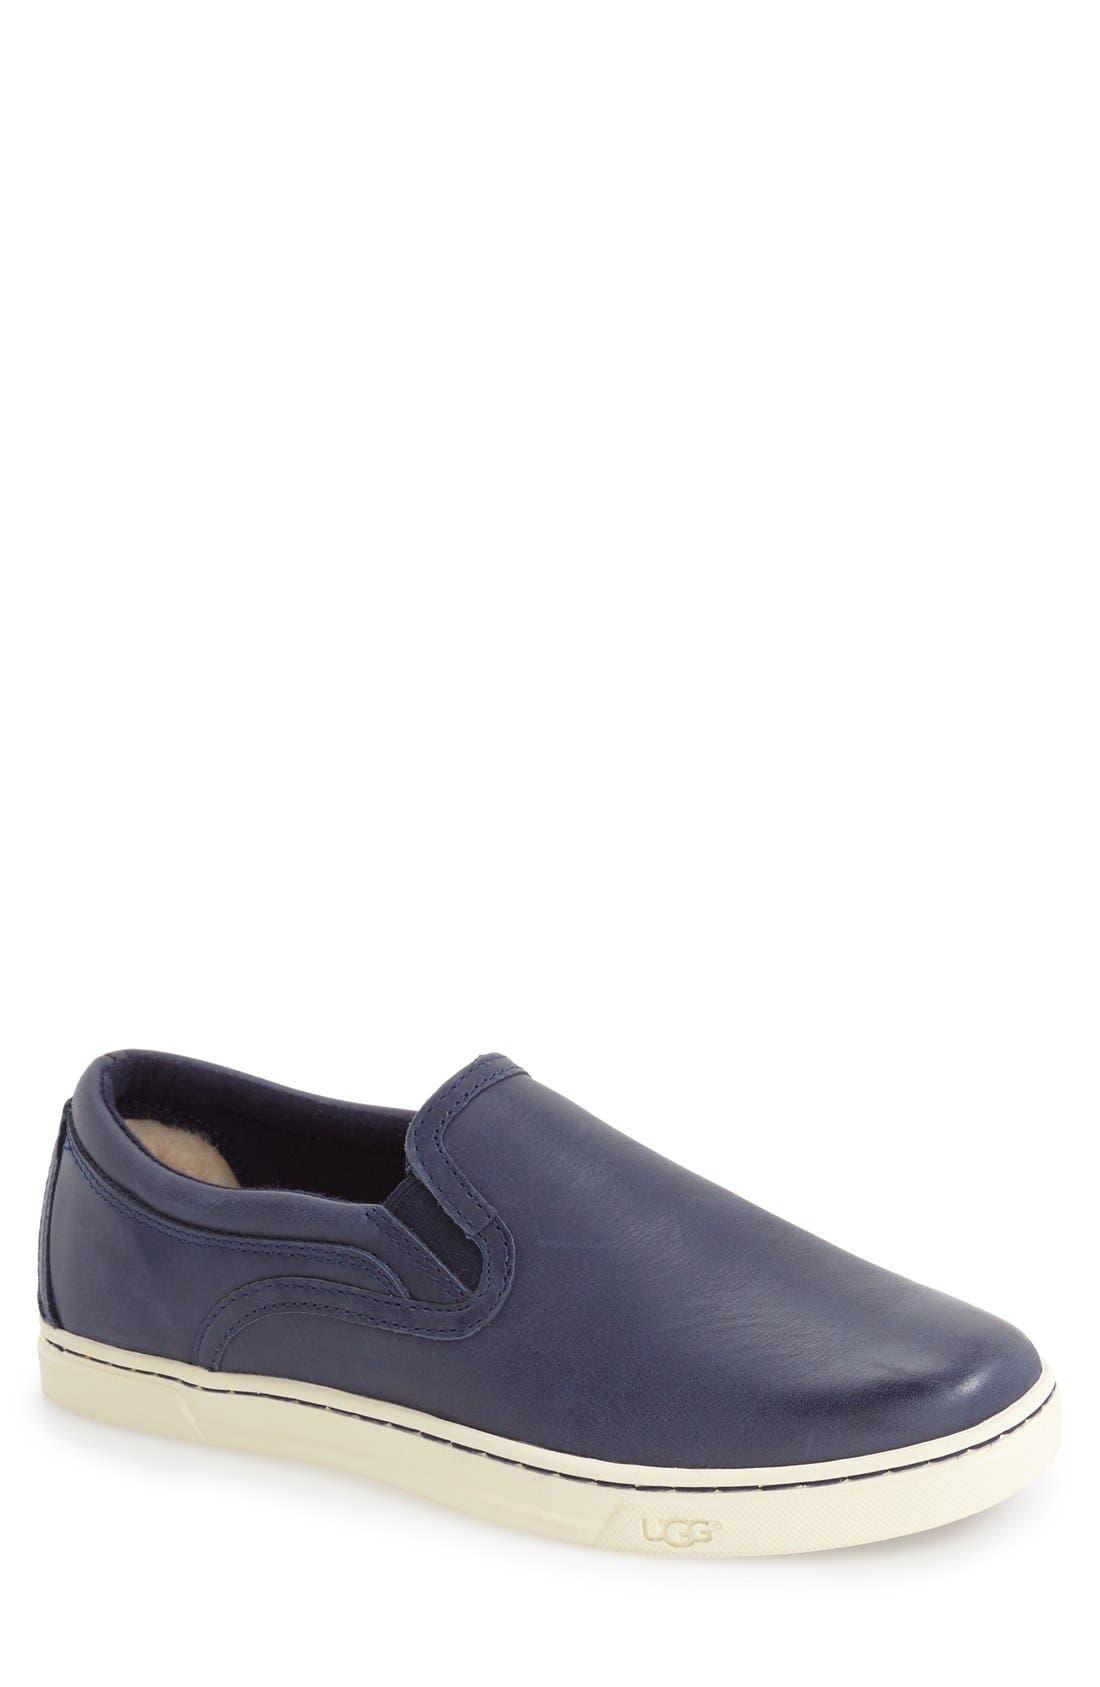 UGG<SUP>®</SUP> Fierce Sneaker